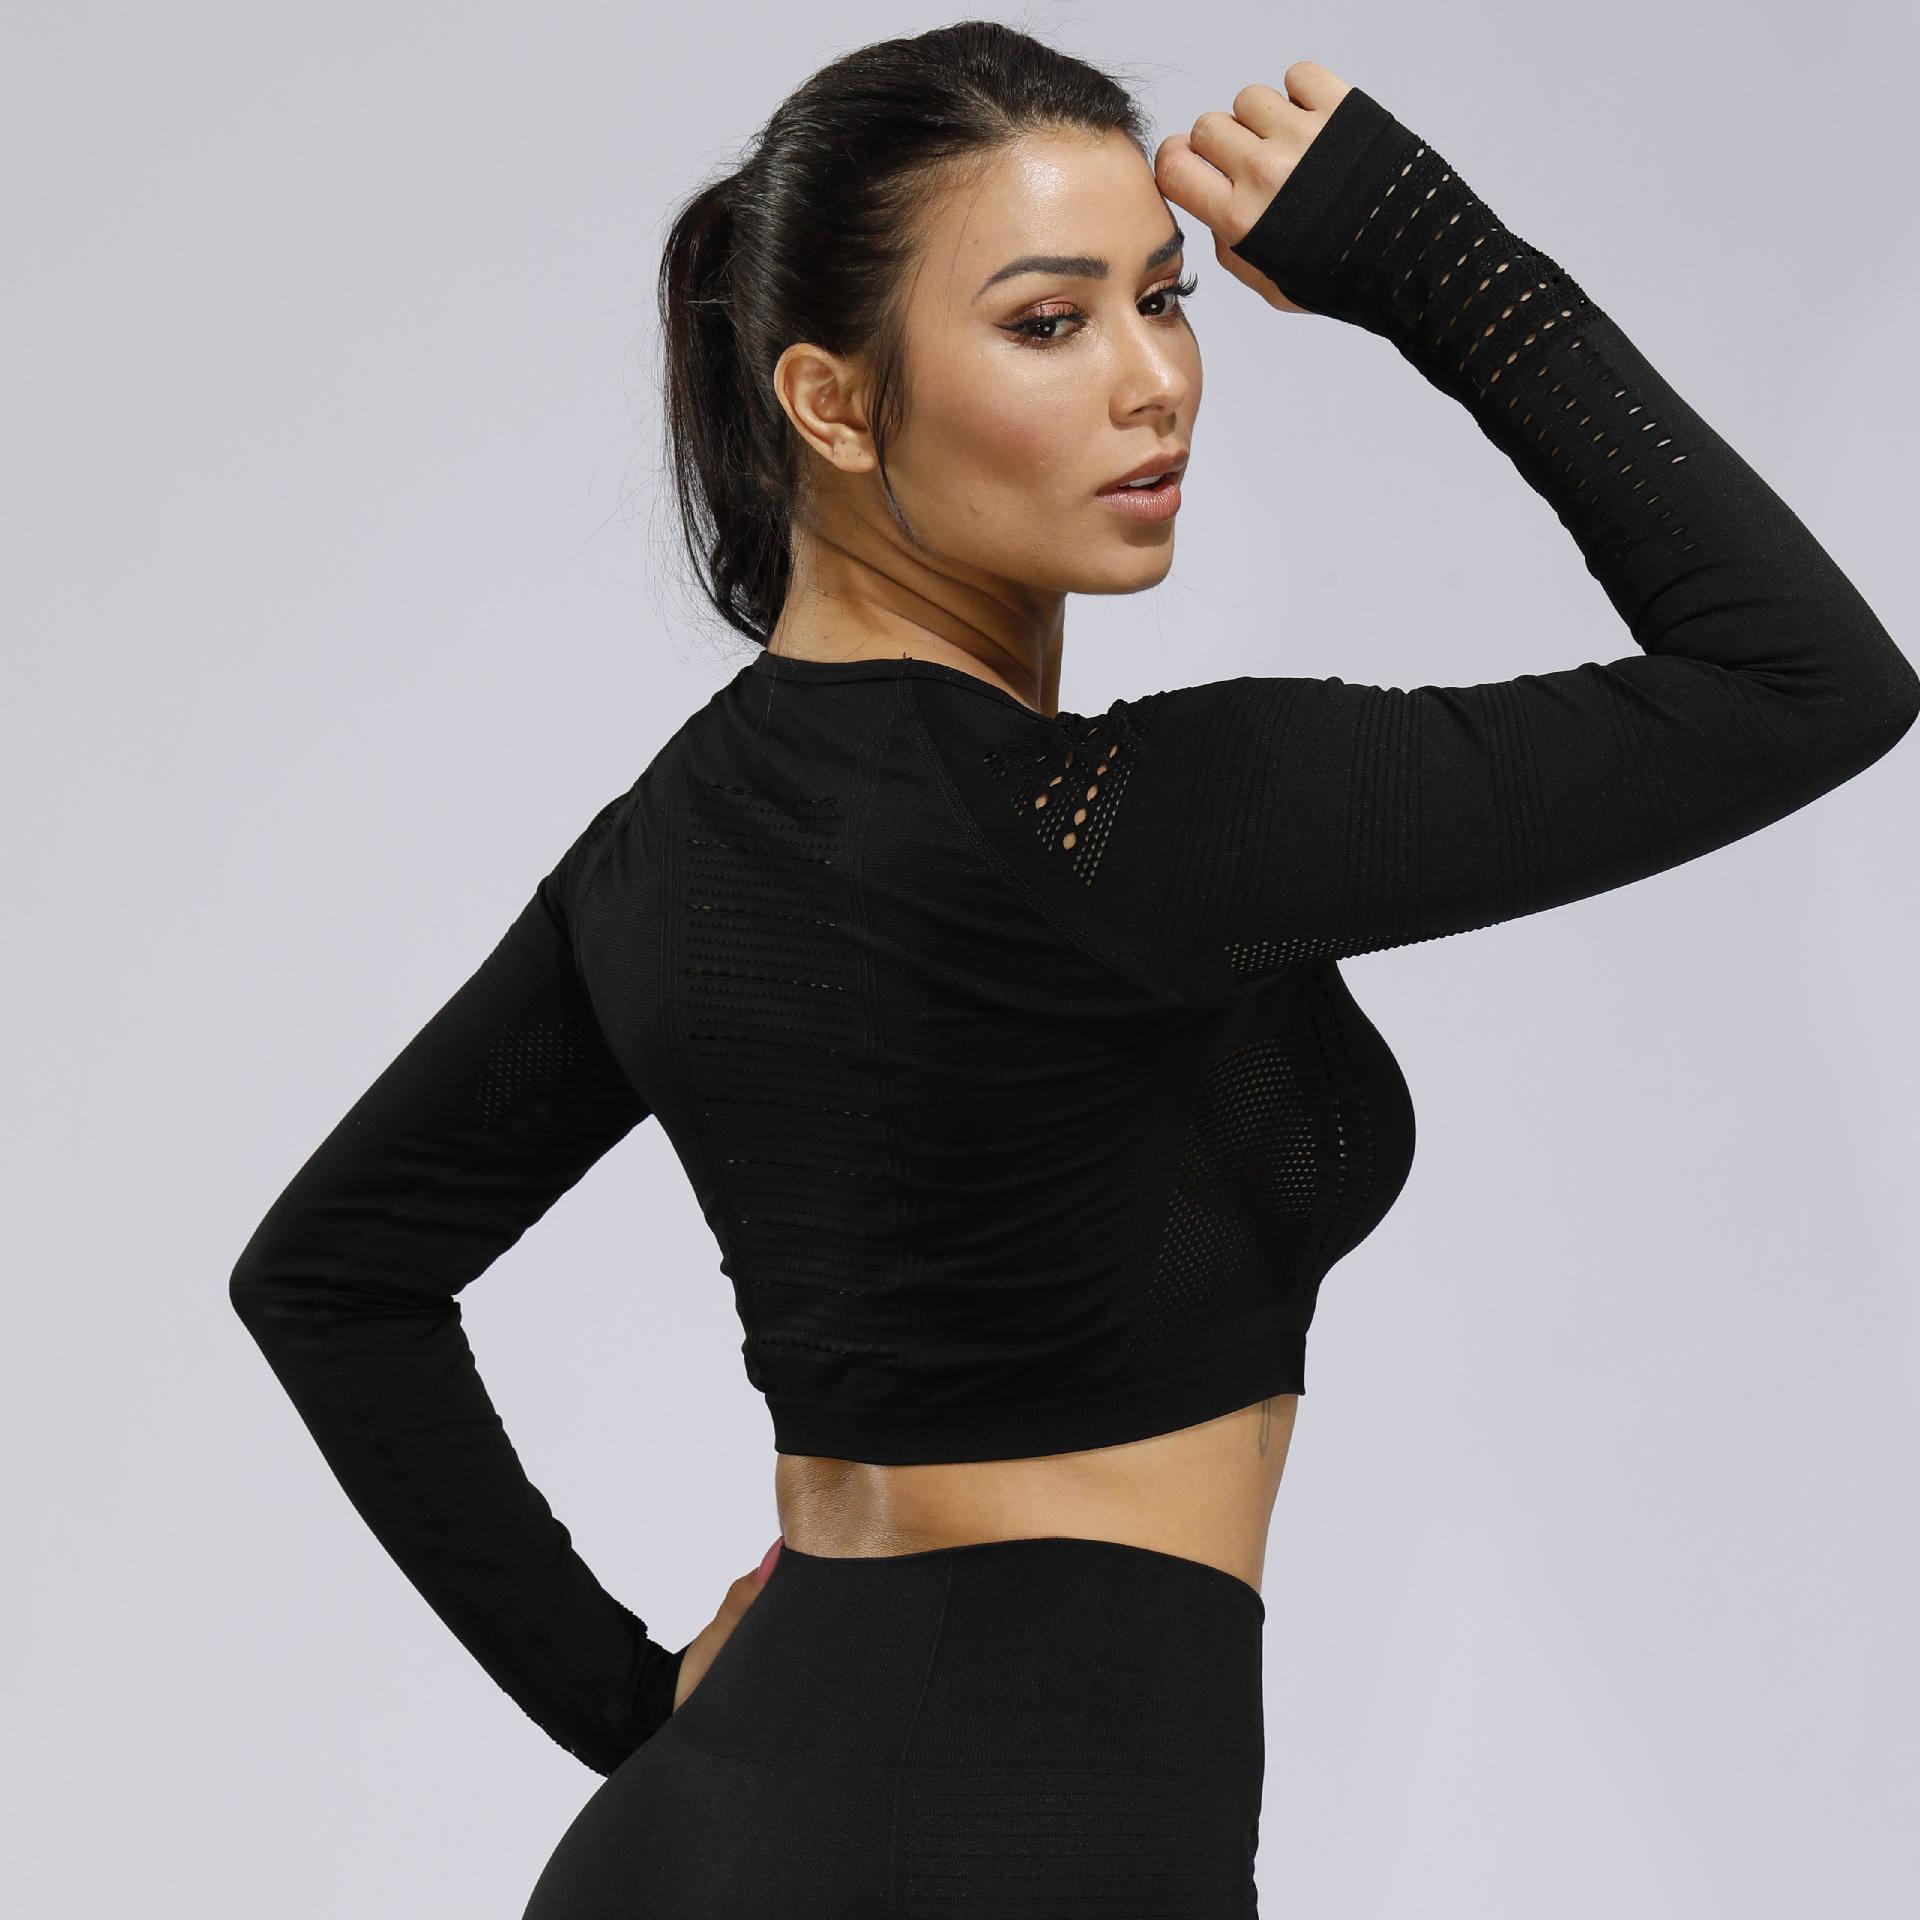 Women Long Sleeve Crop Top